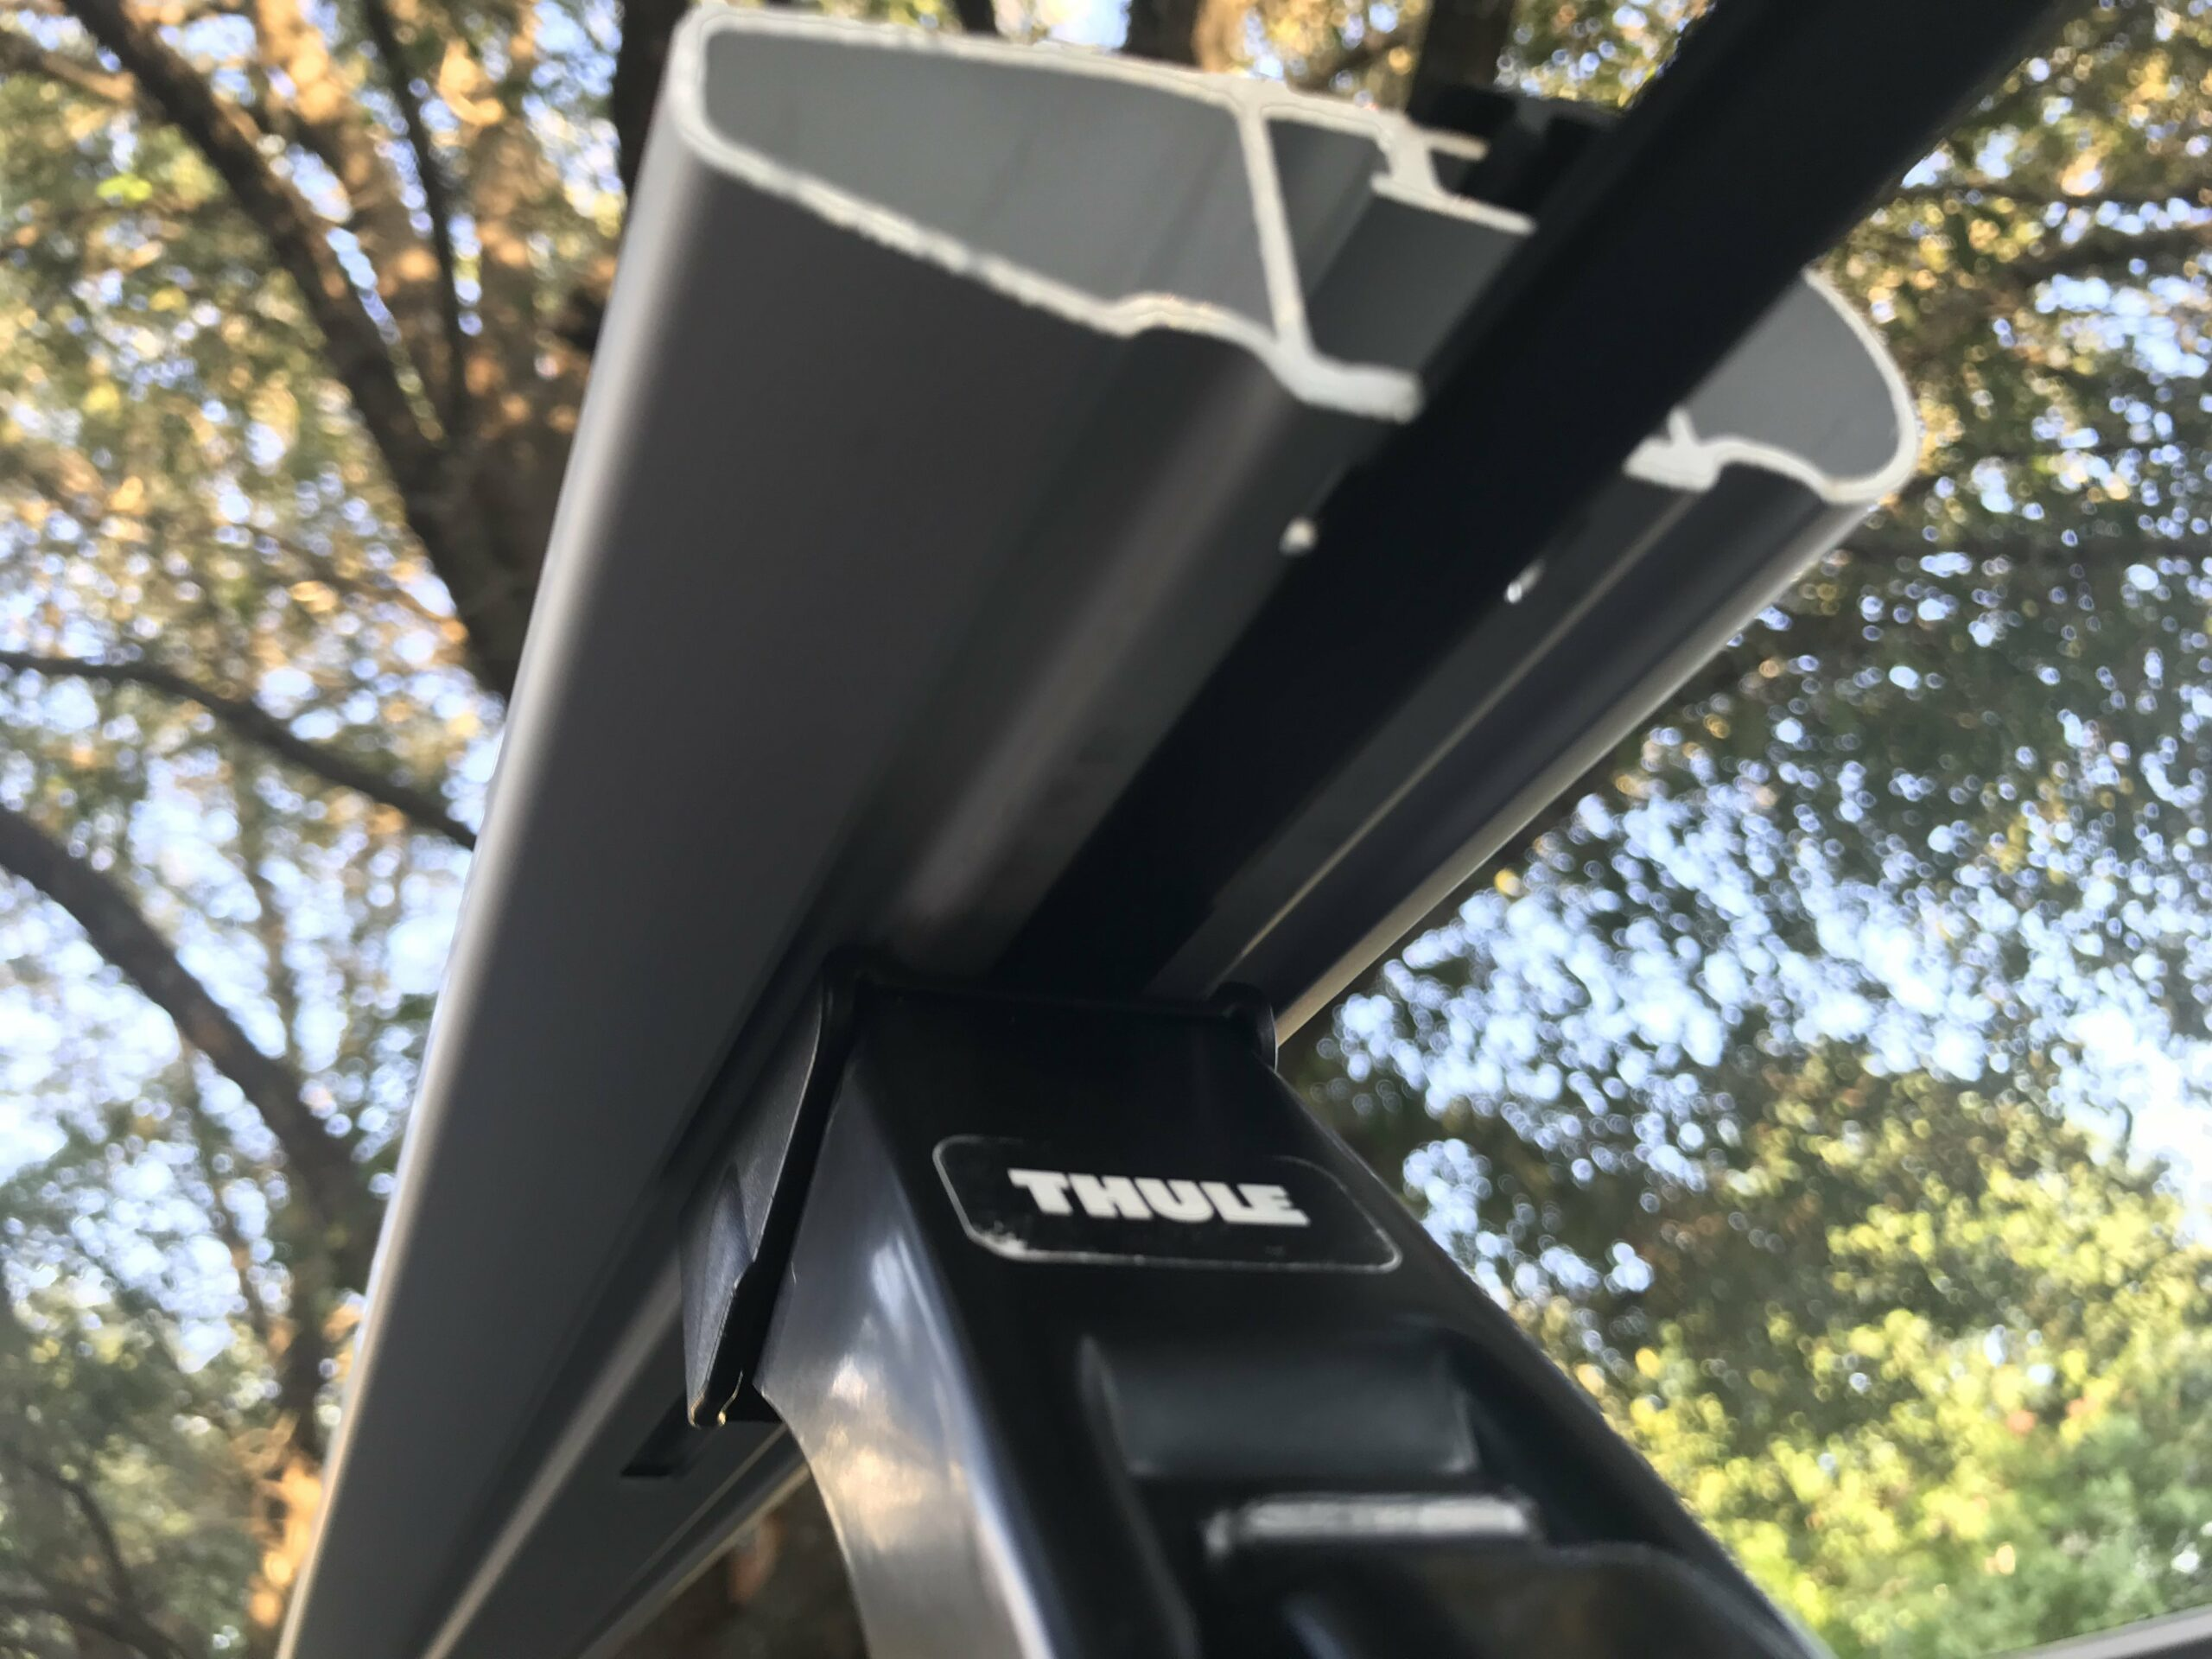 Thule Jeep Wrangler roof rack install